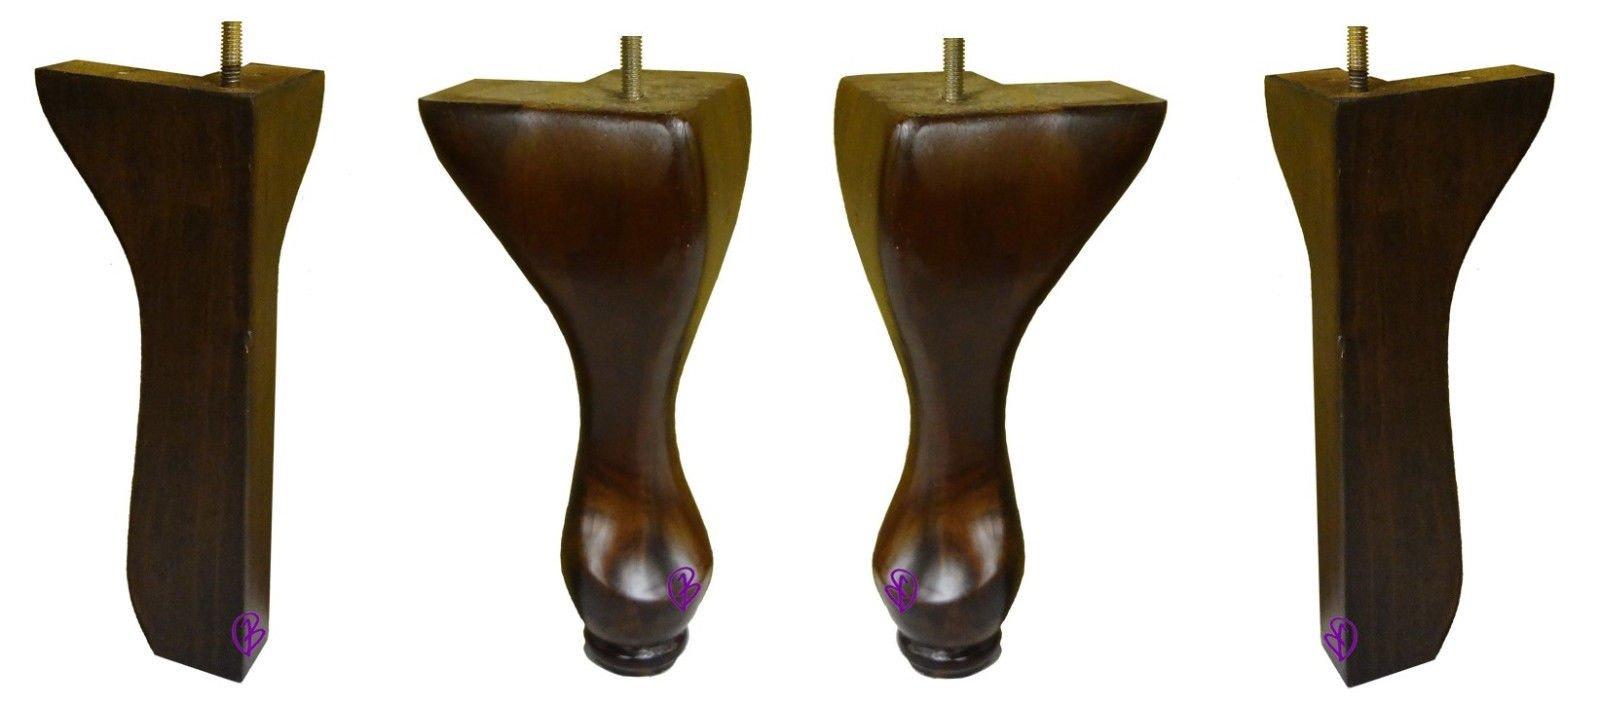 8 1/2'' Queen Wincher Chair Wood Set of 4 Front & Back Legs Dark Walnut Finish with 5/16'' Hanger Bolt